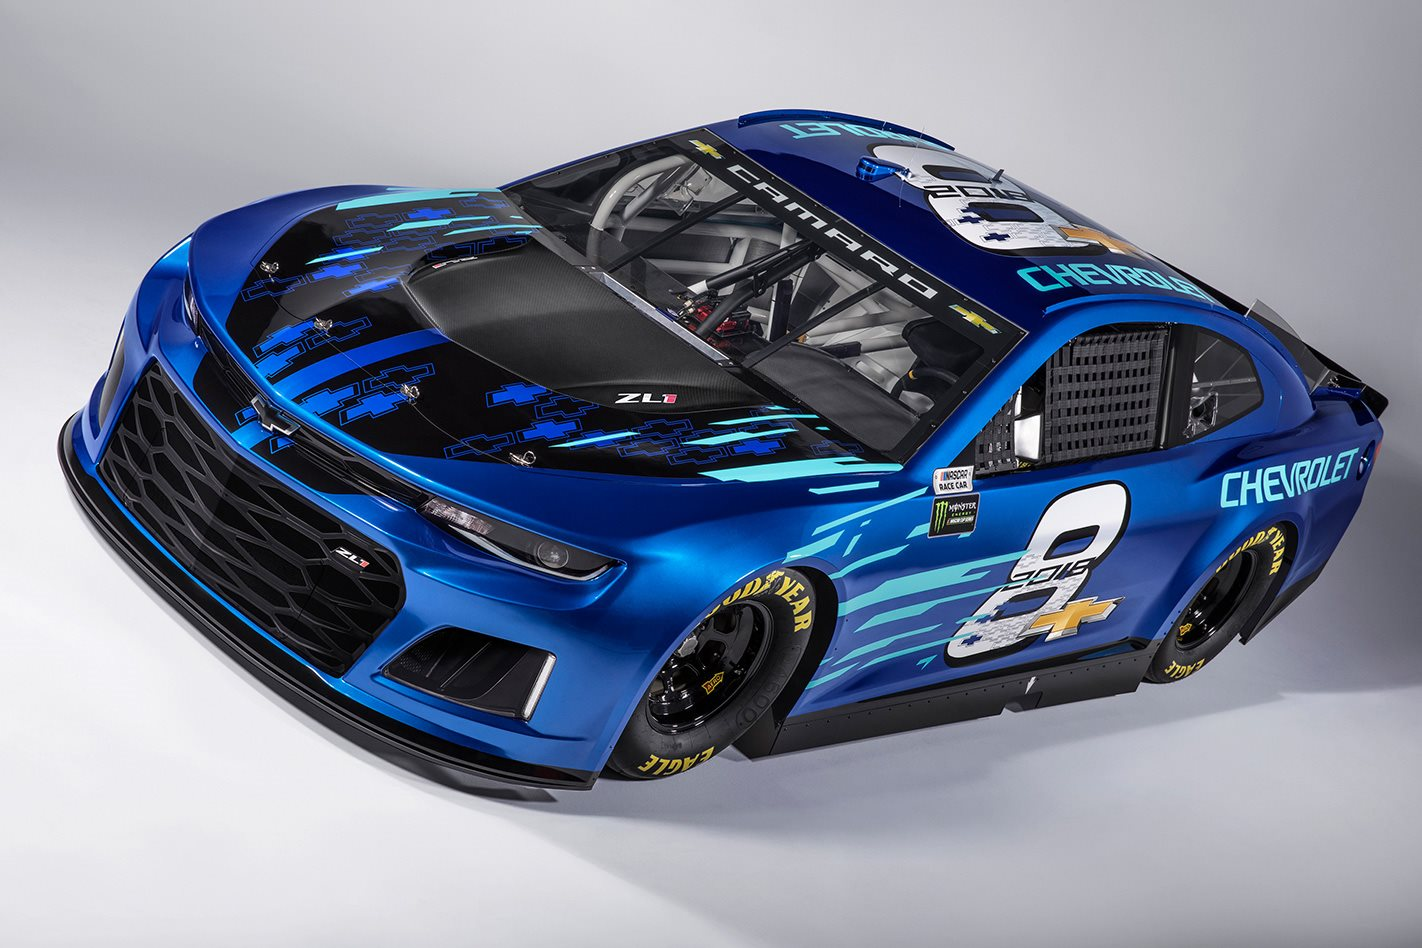 2018 Chevrolet Camaro ZL1 NASCAR Cup Series